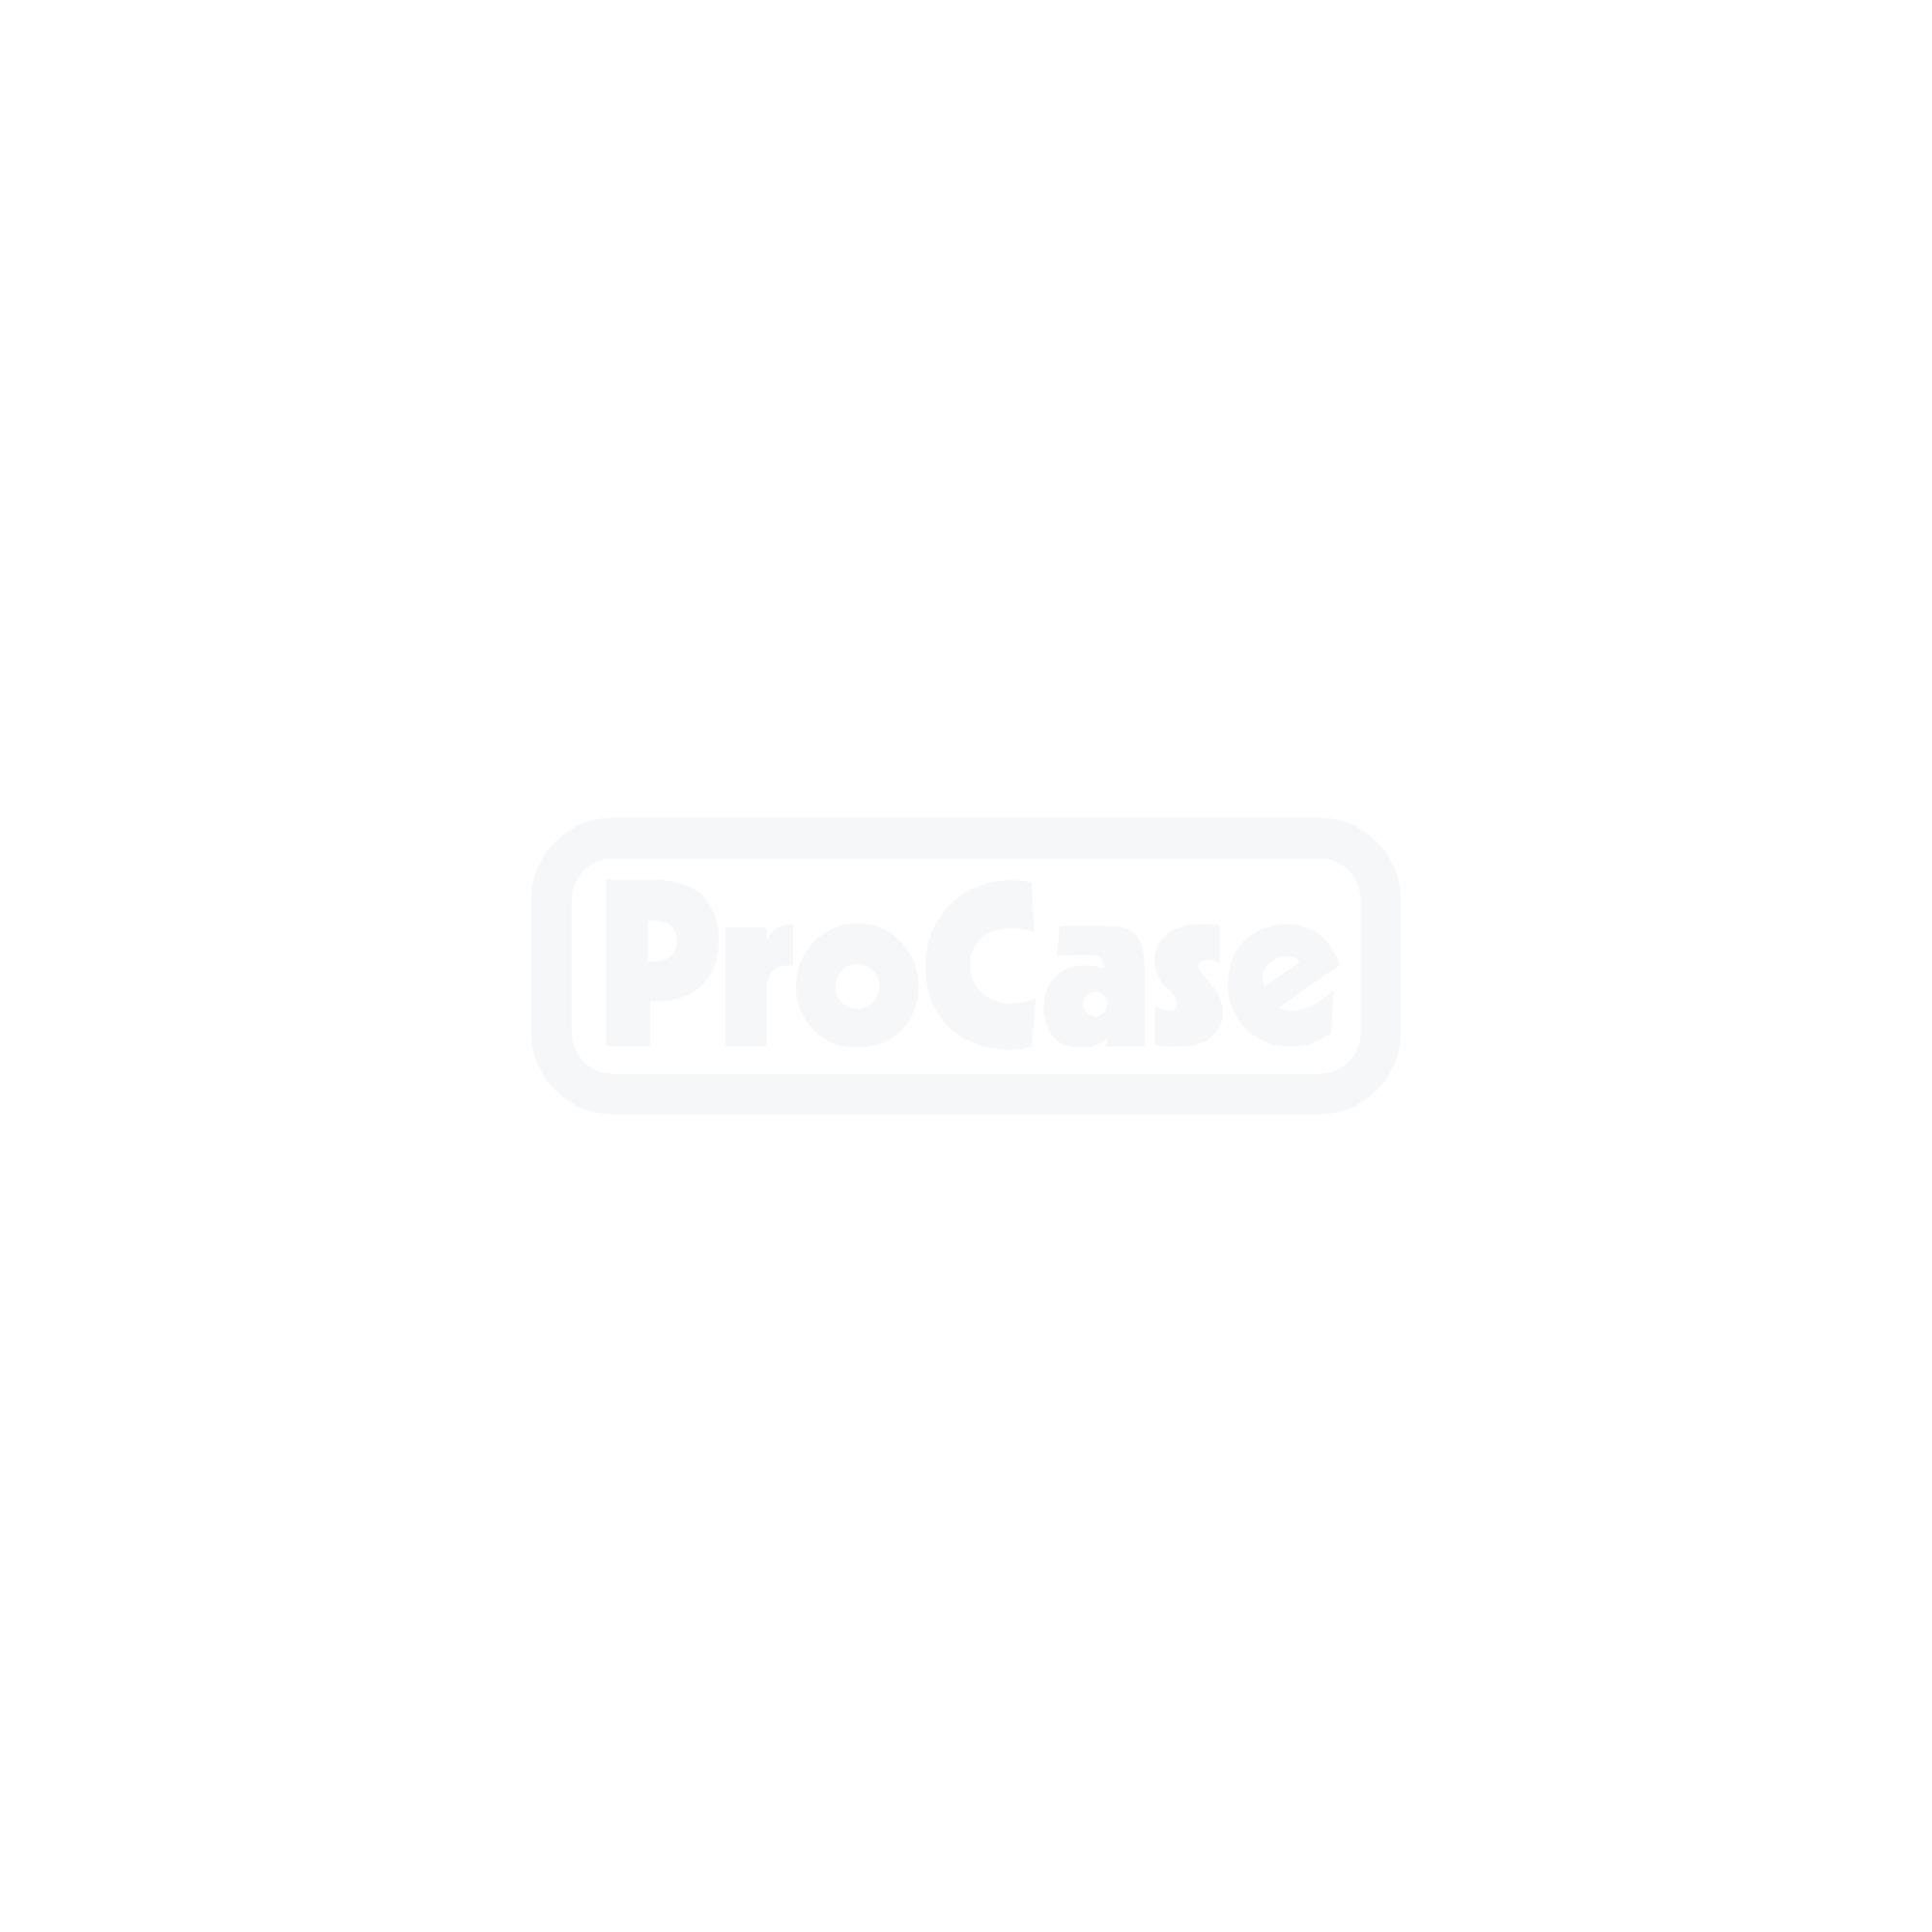 Flightcase für 3x LG 32LN5406 LED-TV